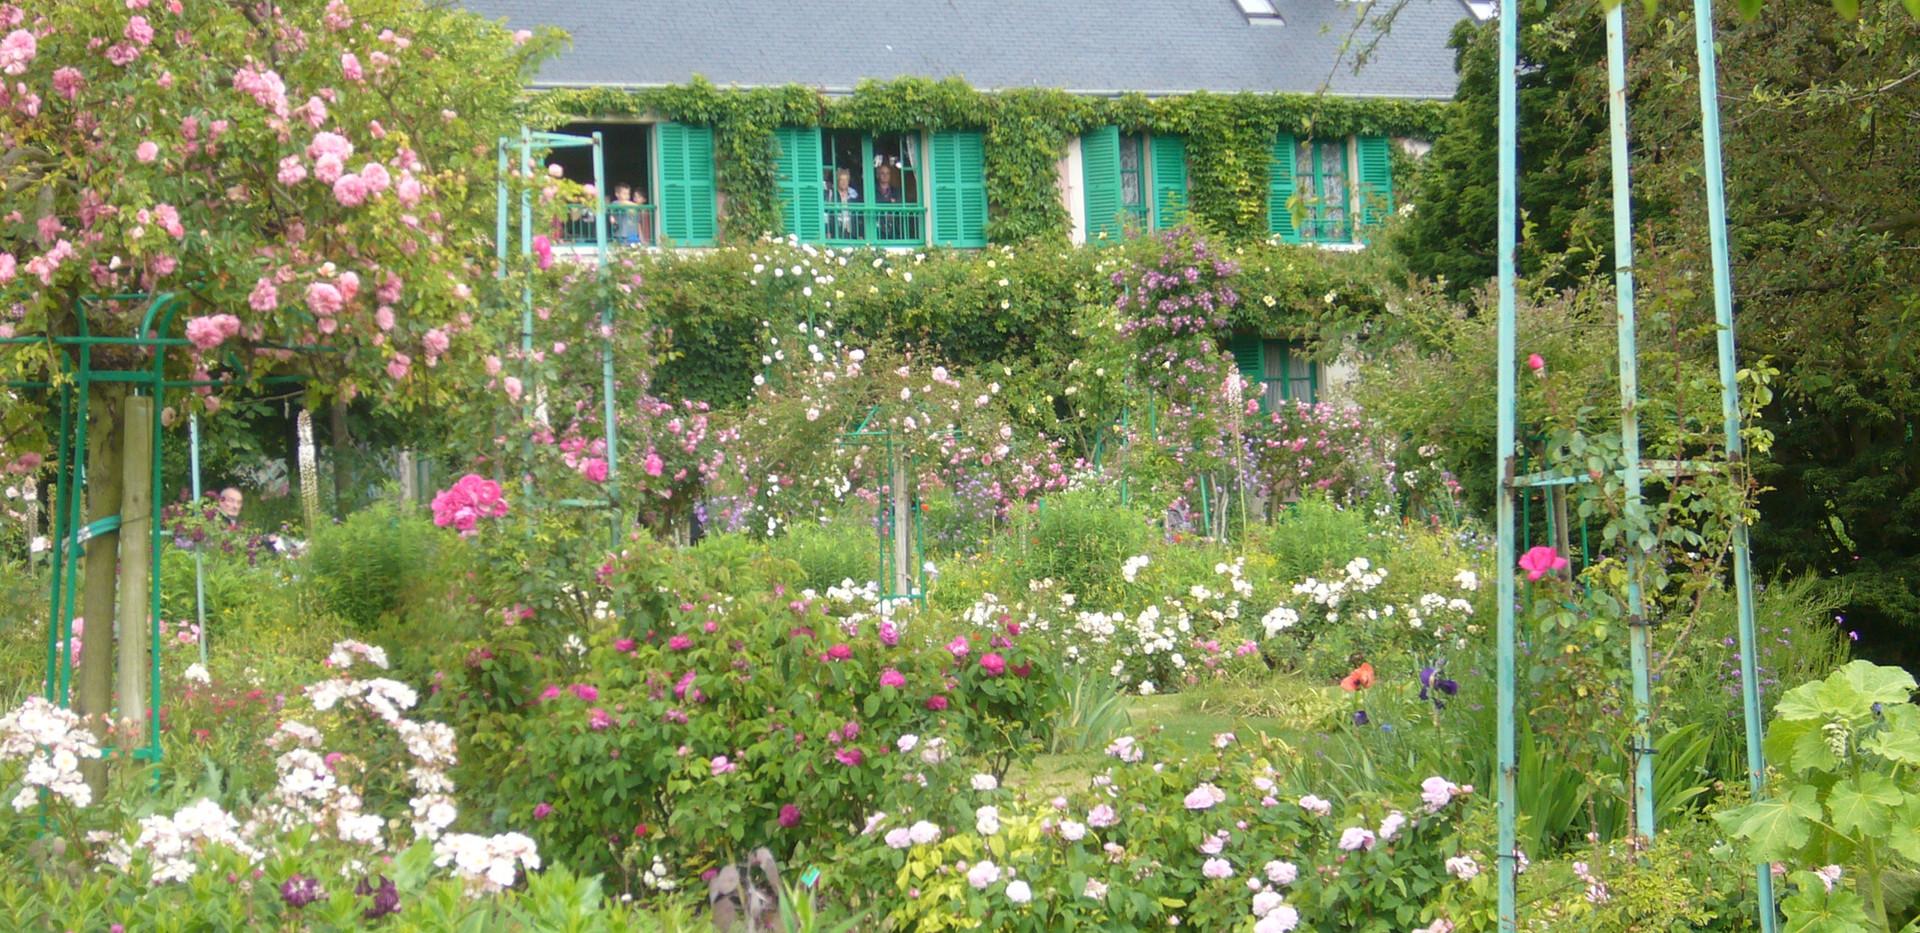 Maison de Monet, Giverny